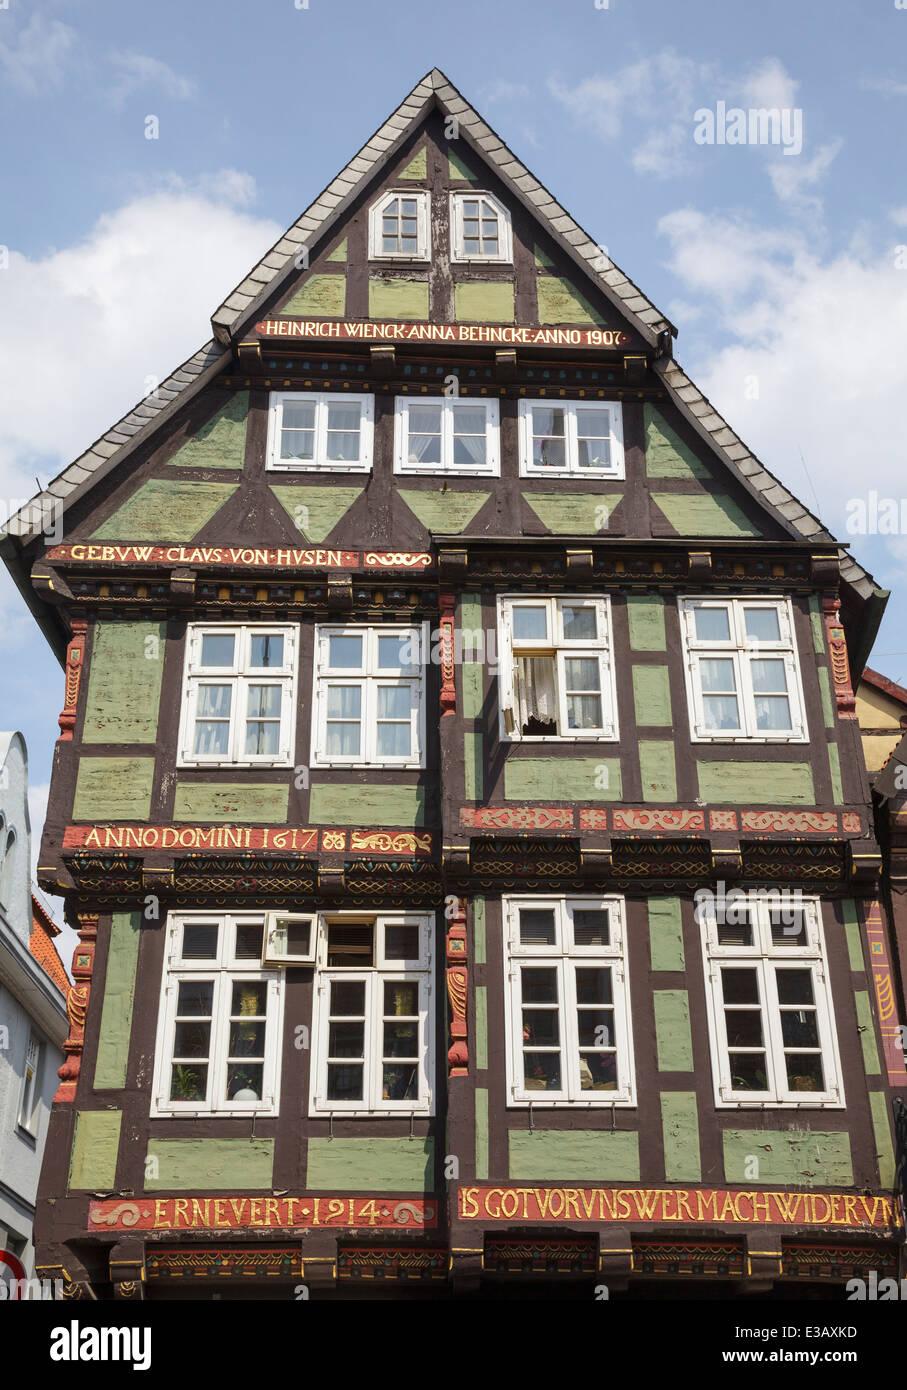 Timber frame building corner of Markt and Neue Strasse